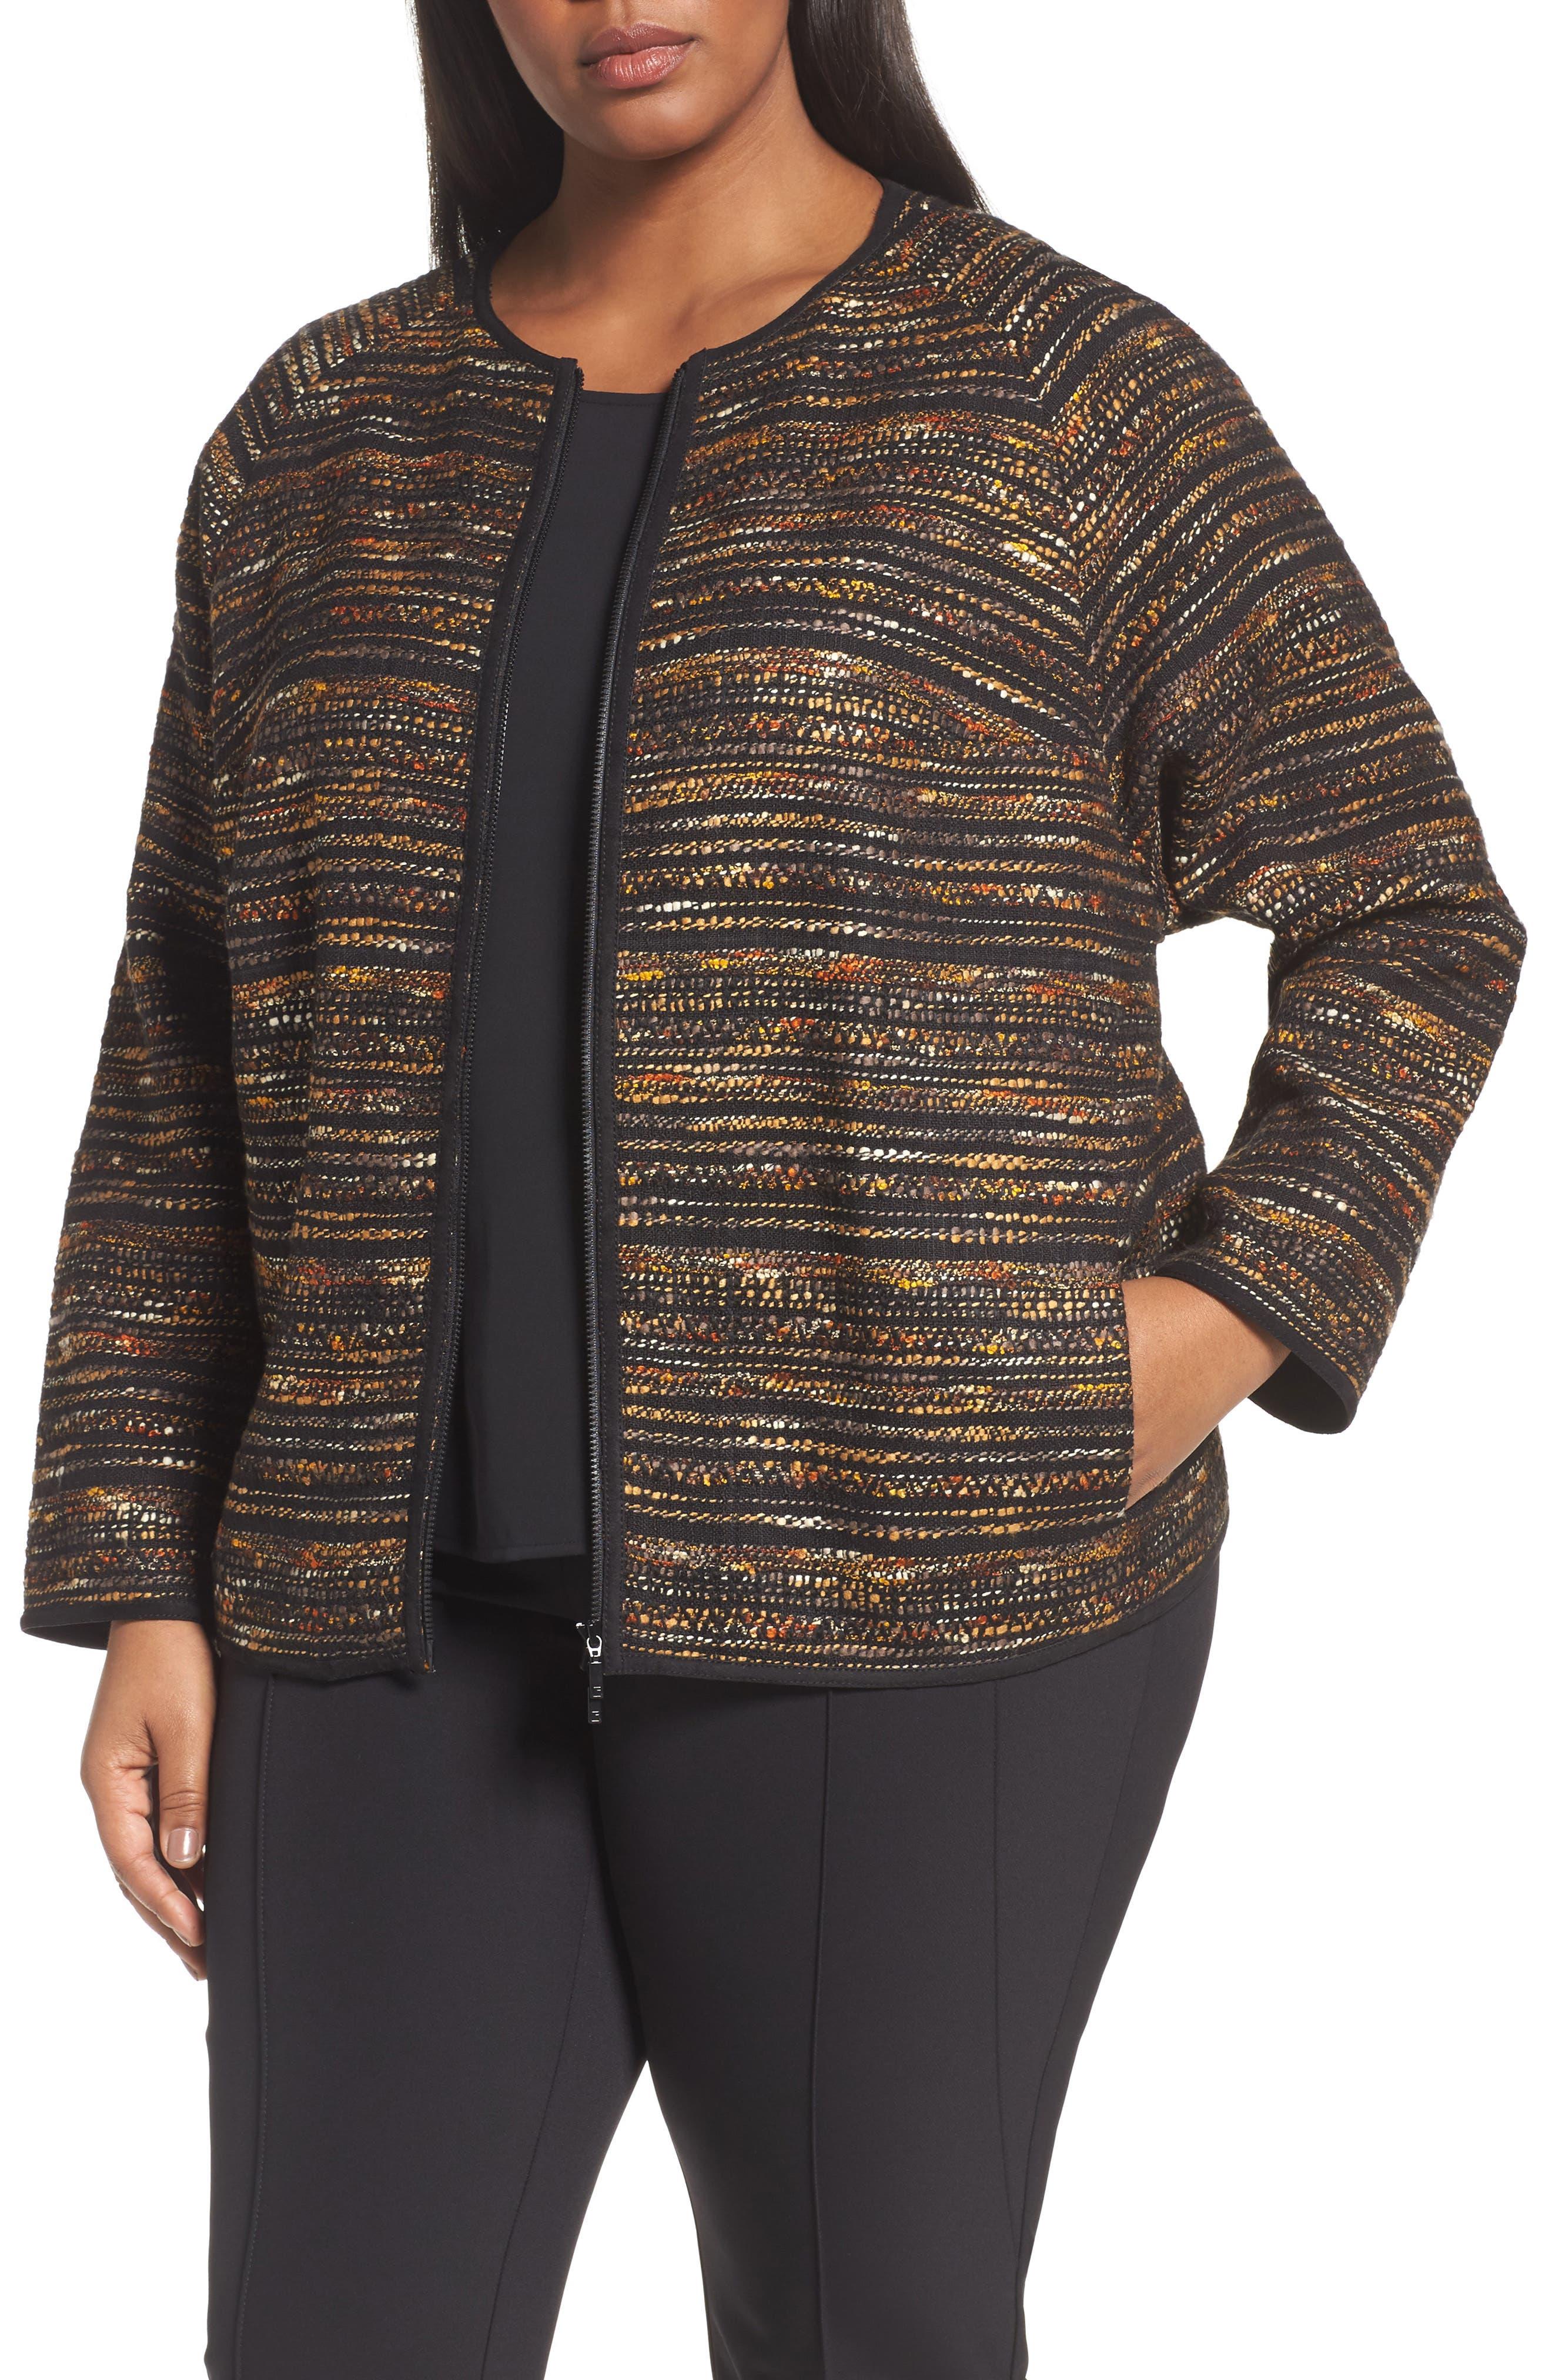 Alternate Image 1 Selected - Lafayette 148 New York Alexa Tweed Jacket (Plus Size)